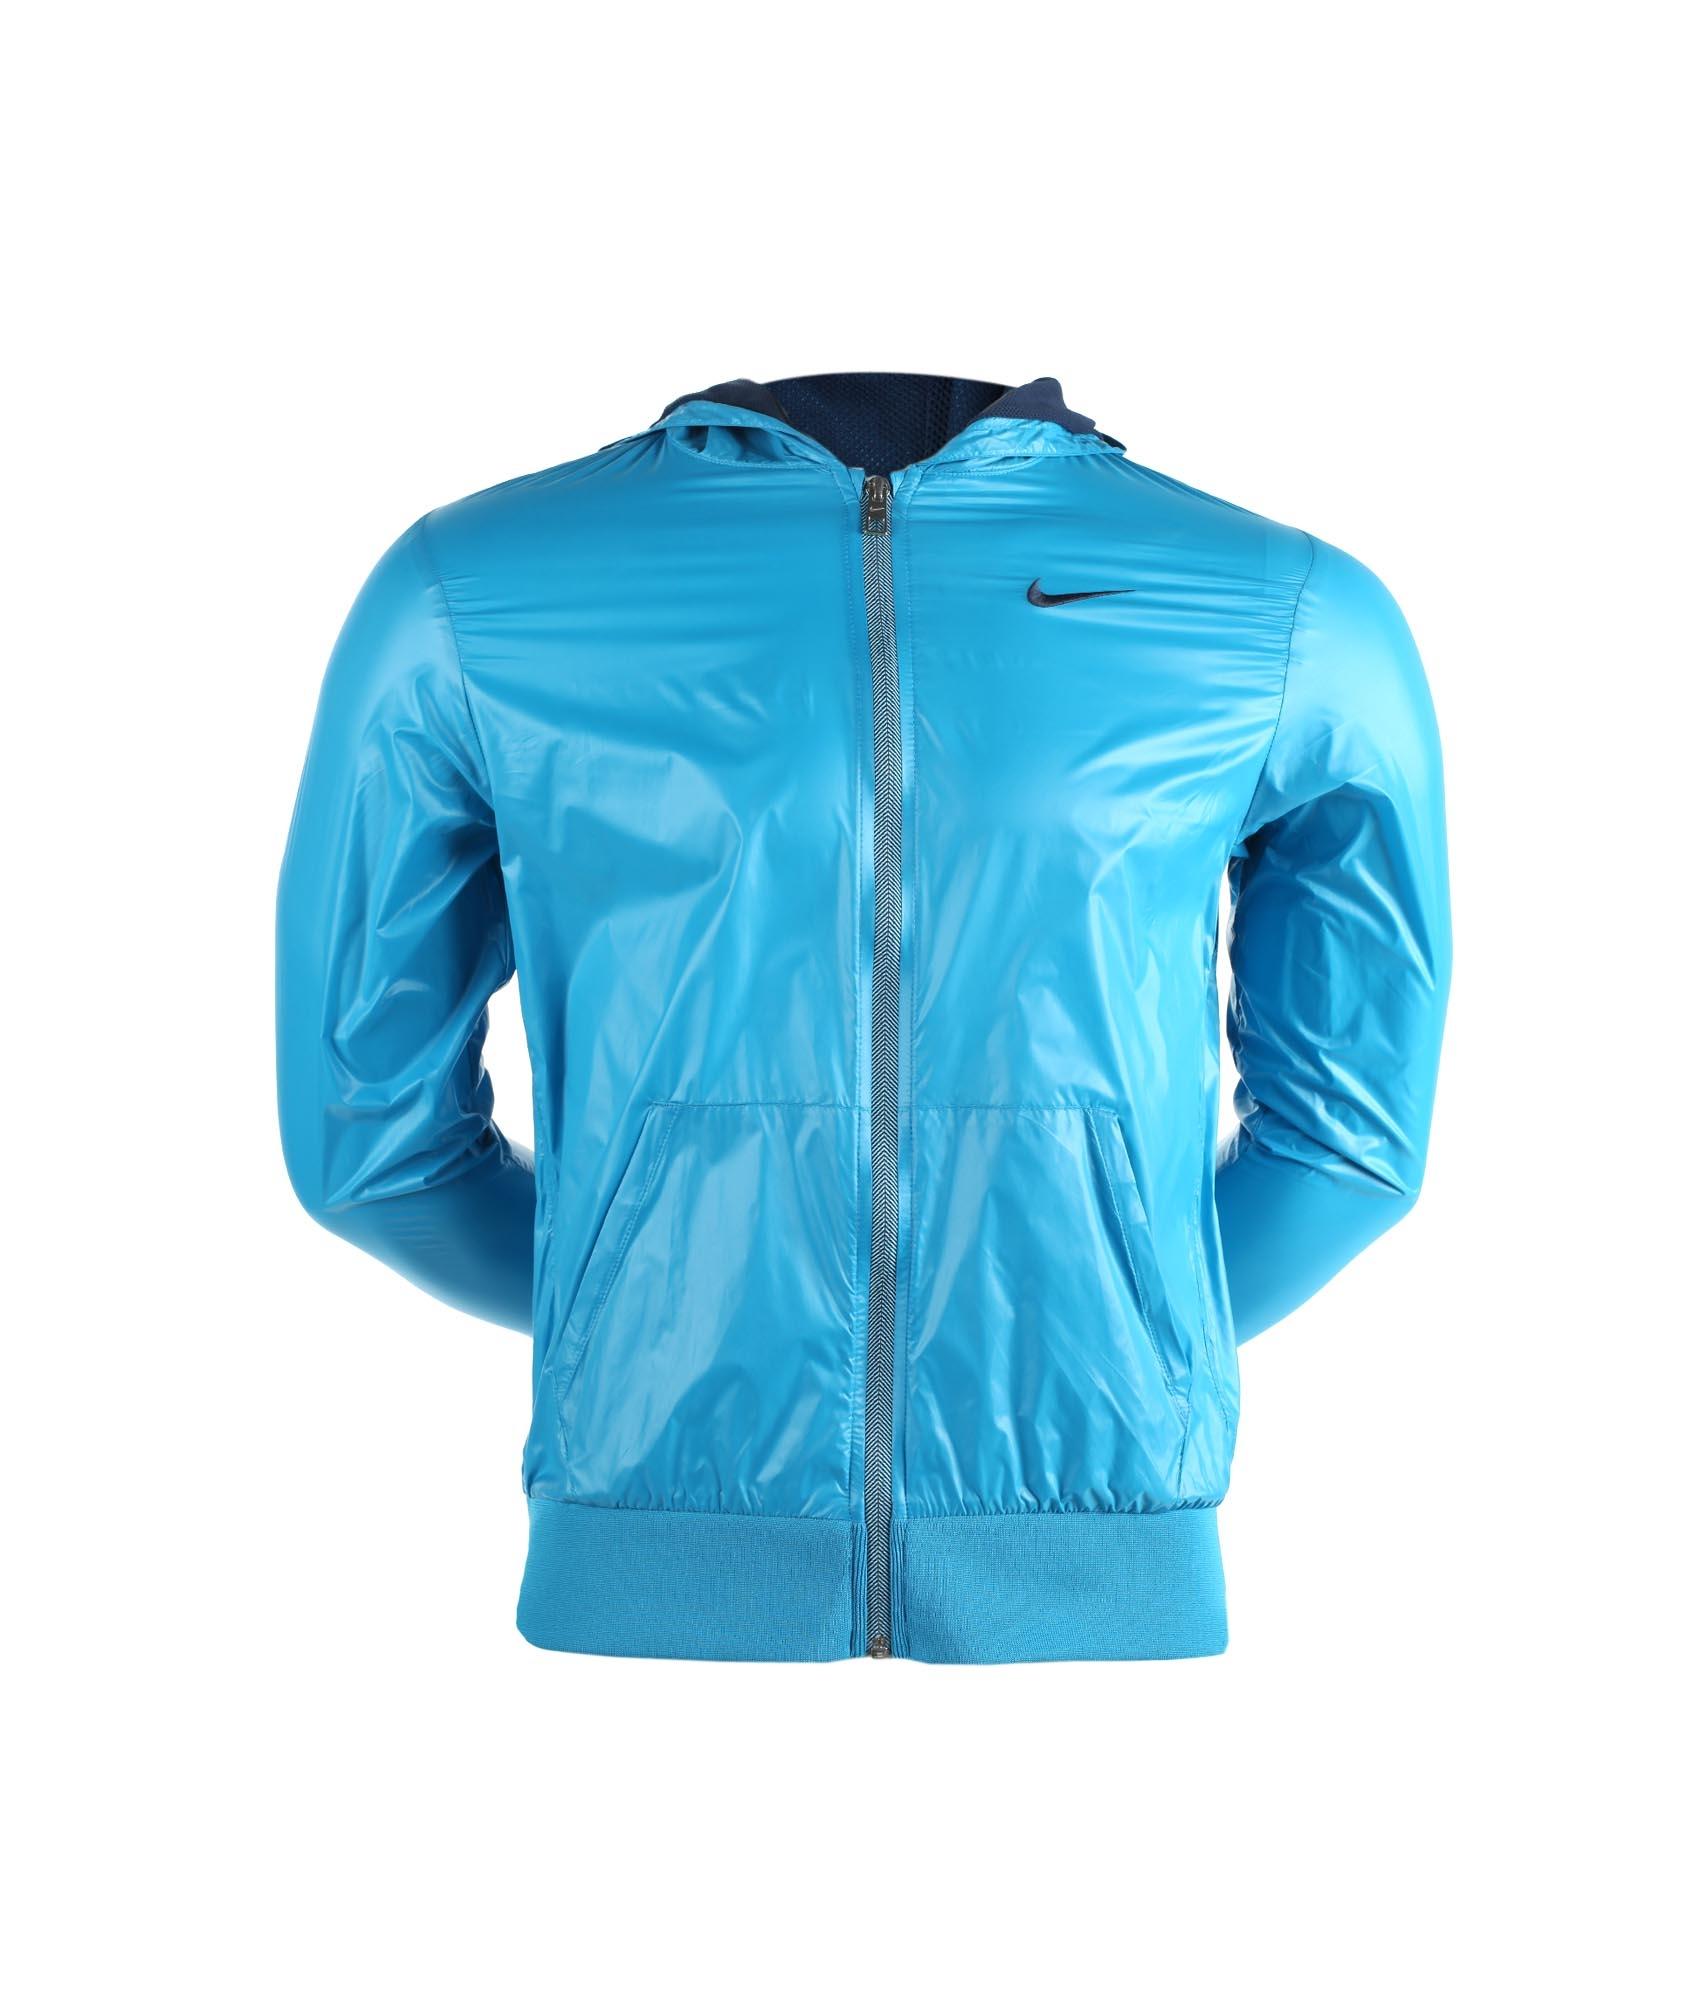 Куртка Nike YA76 ULTRA LGTWHT JKT-YTH, Цвет-Голубой, Размер-M